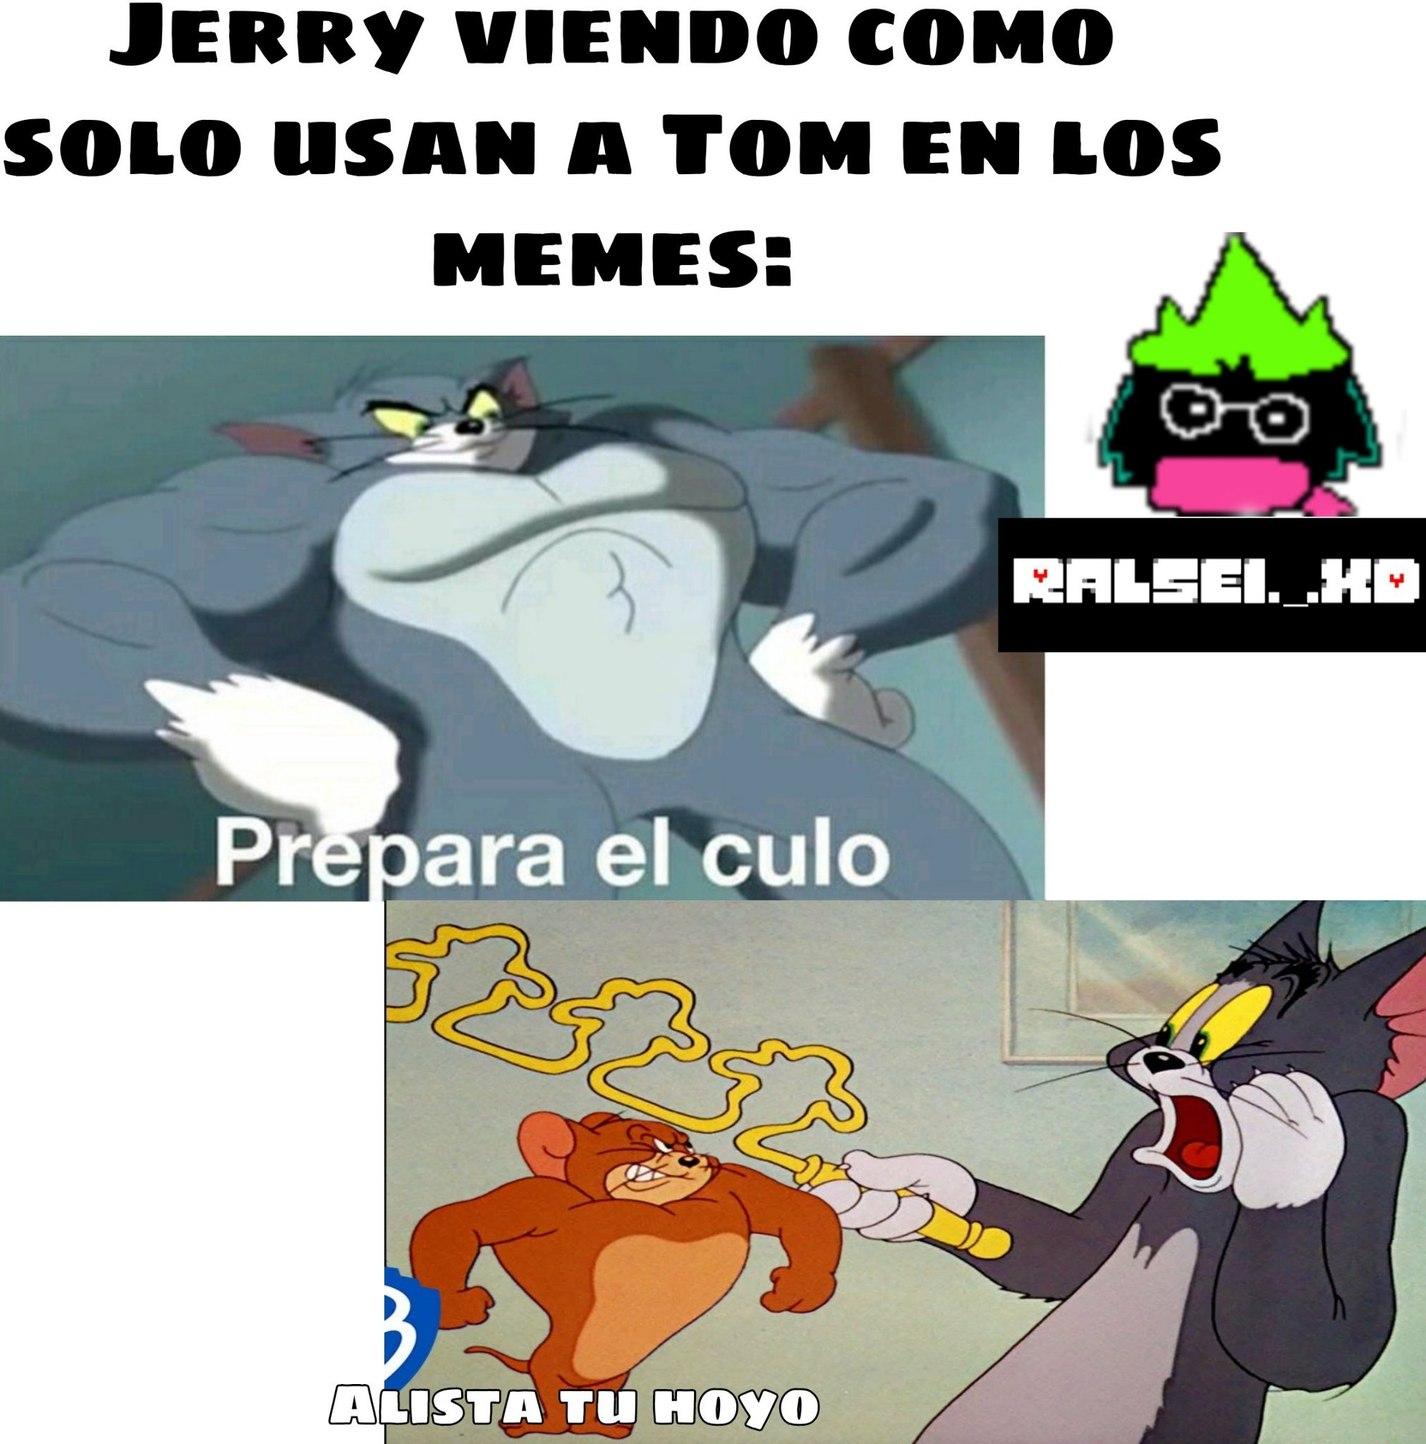 Se cuidadoso con tu agujero - meme